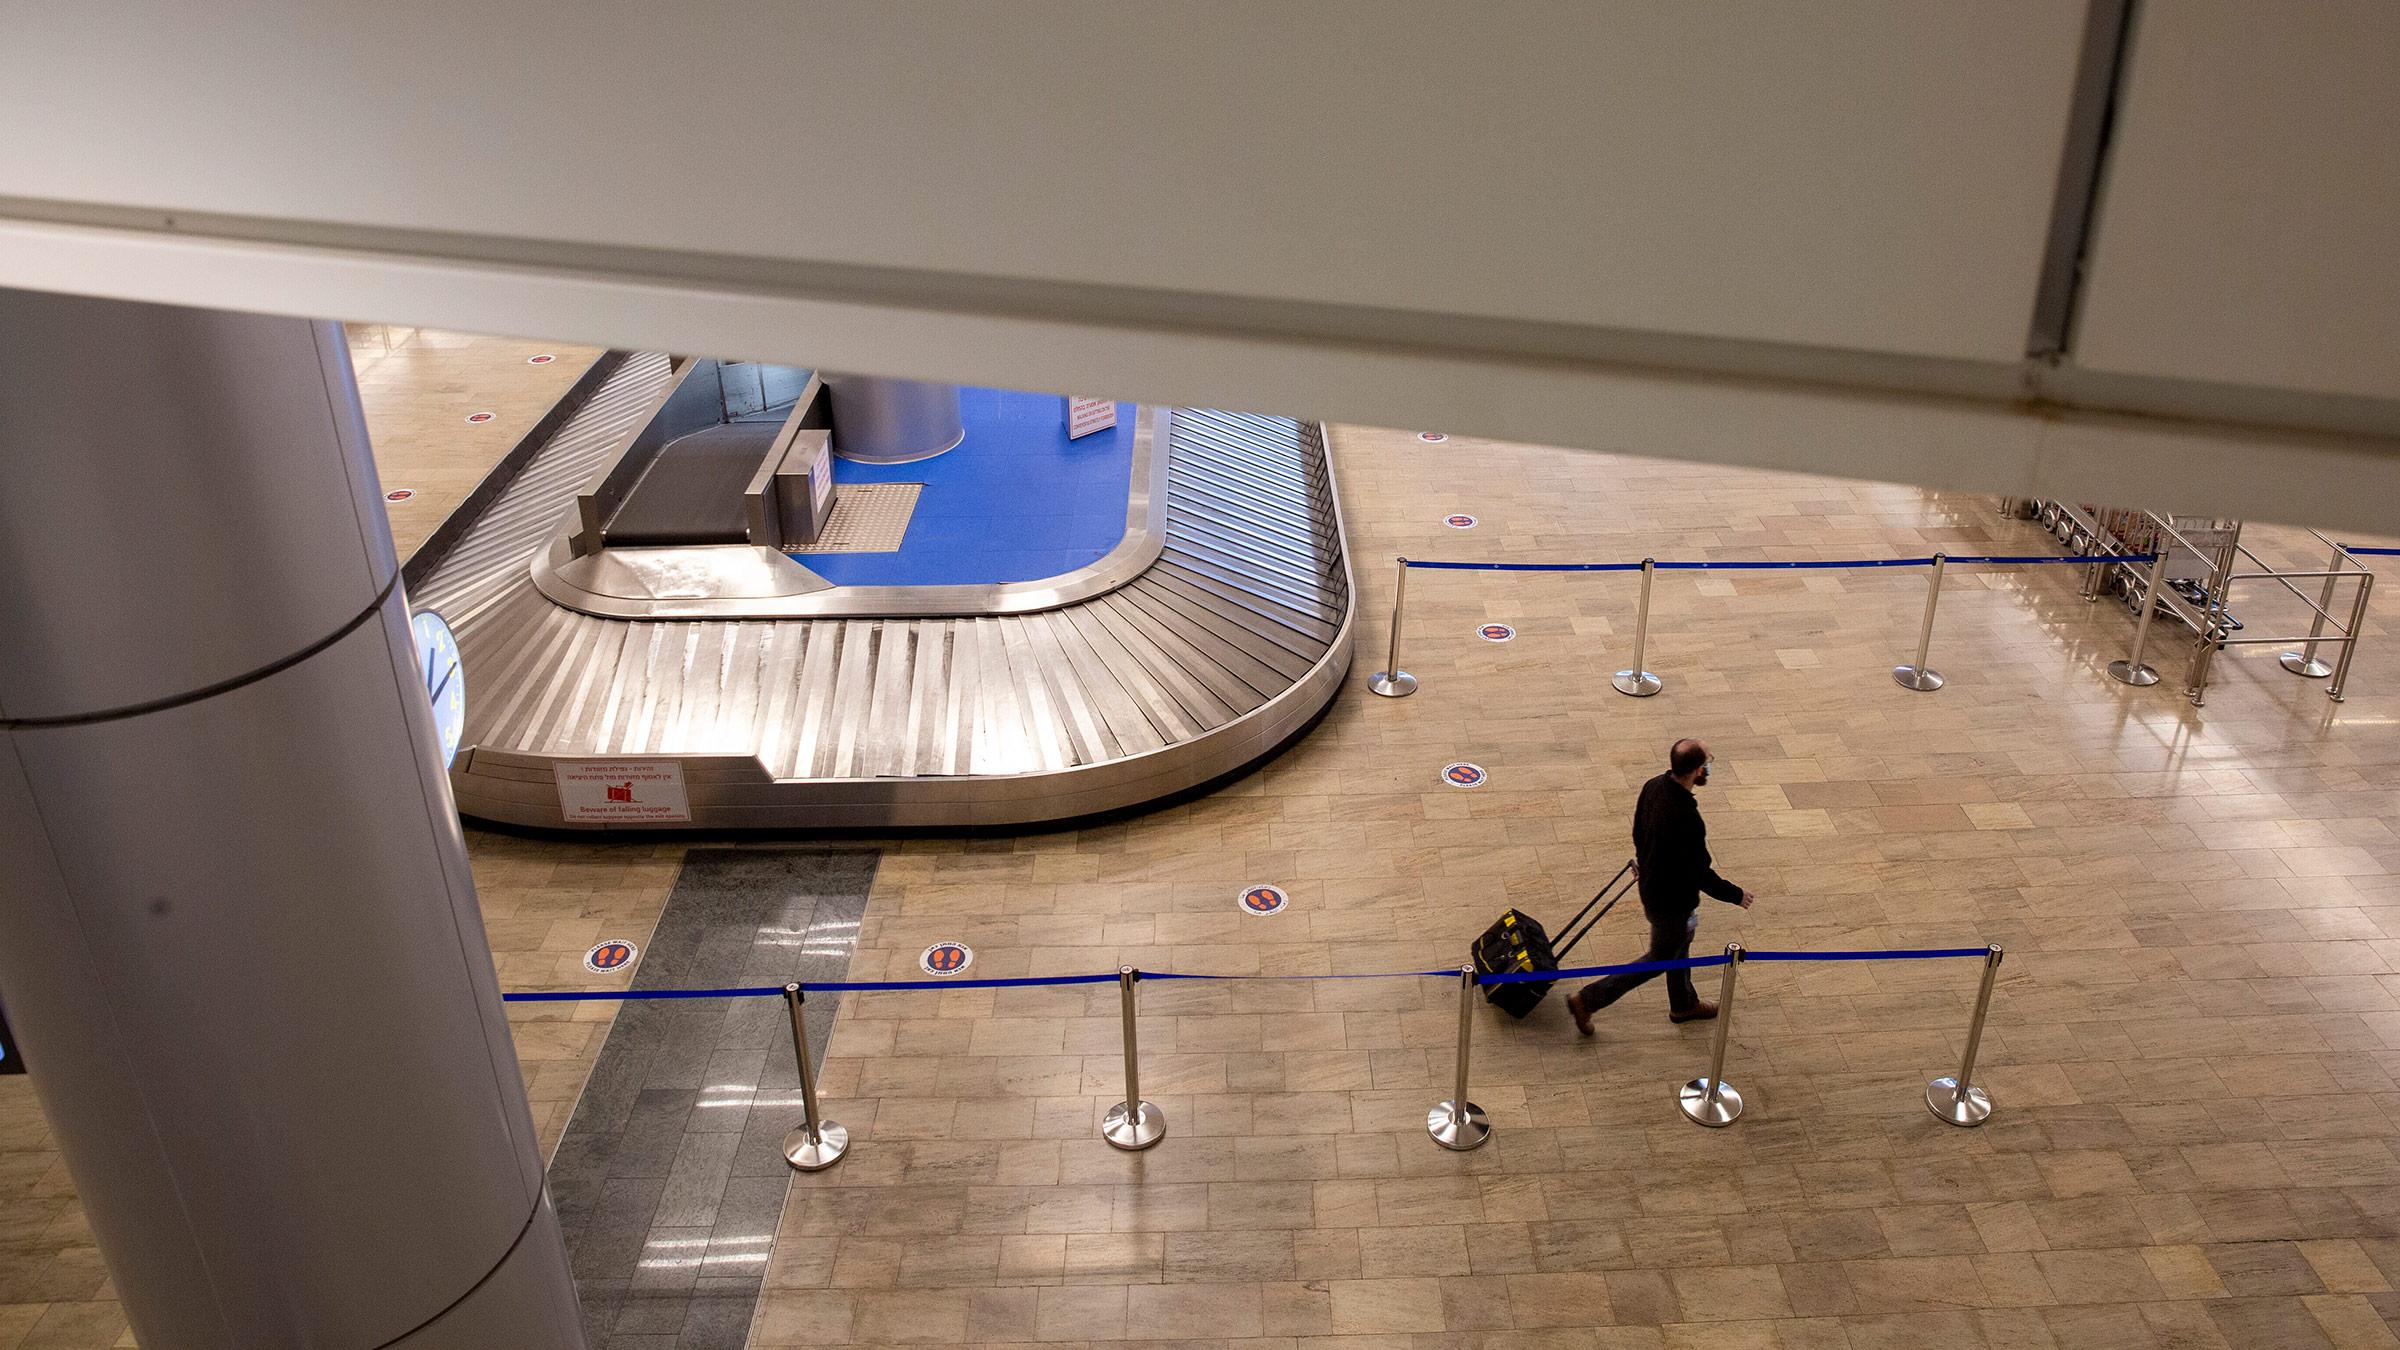 A passenger walks through the arrival hall of Ben Gurion Airport near Tel Aviv, Israel, on Sunday, January 24.